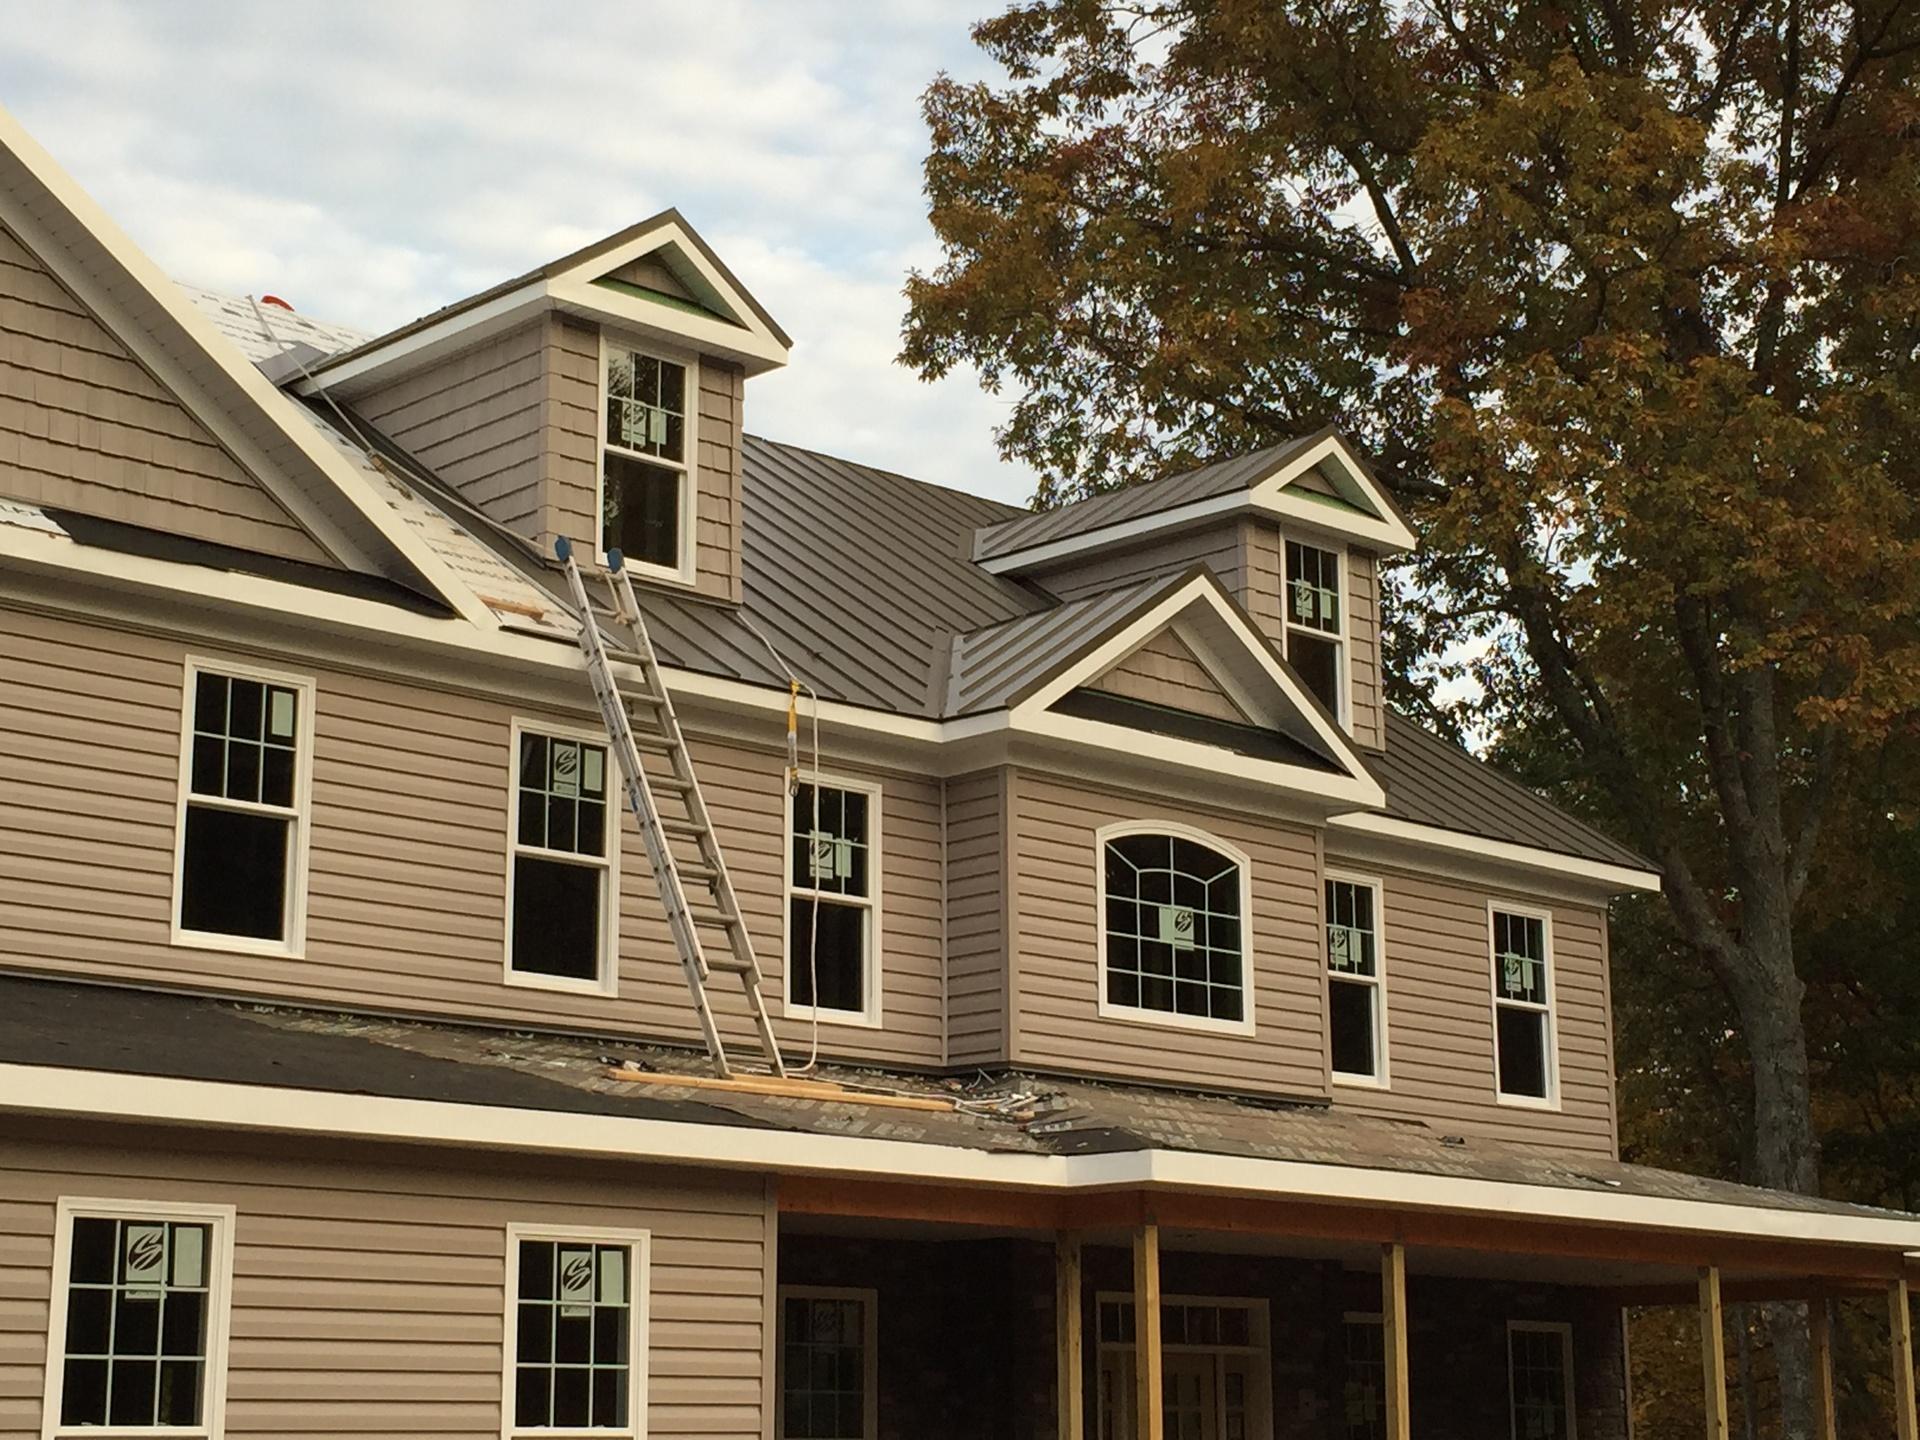 standing seam metal roof being installed